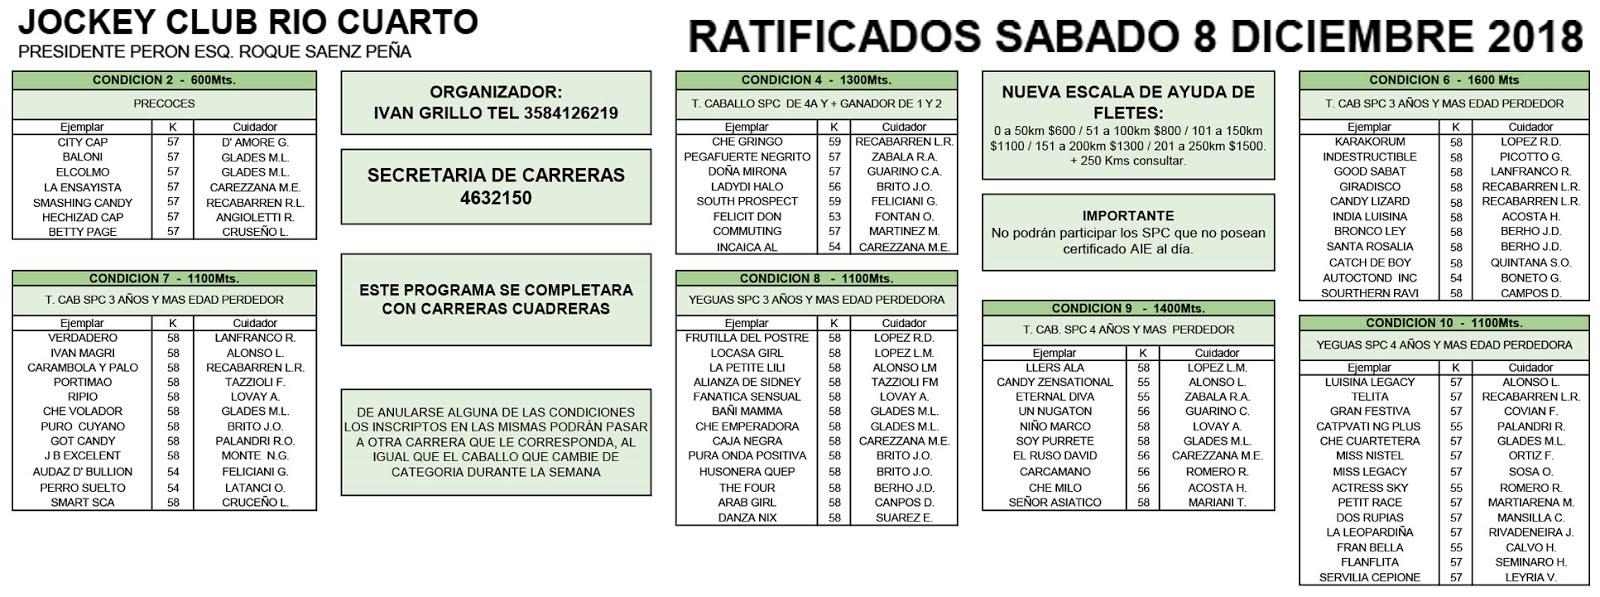 Ratificados - SAB 8DIC - Jockey Club Río Cuarto